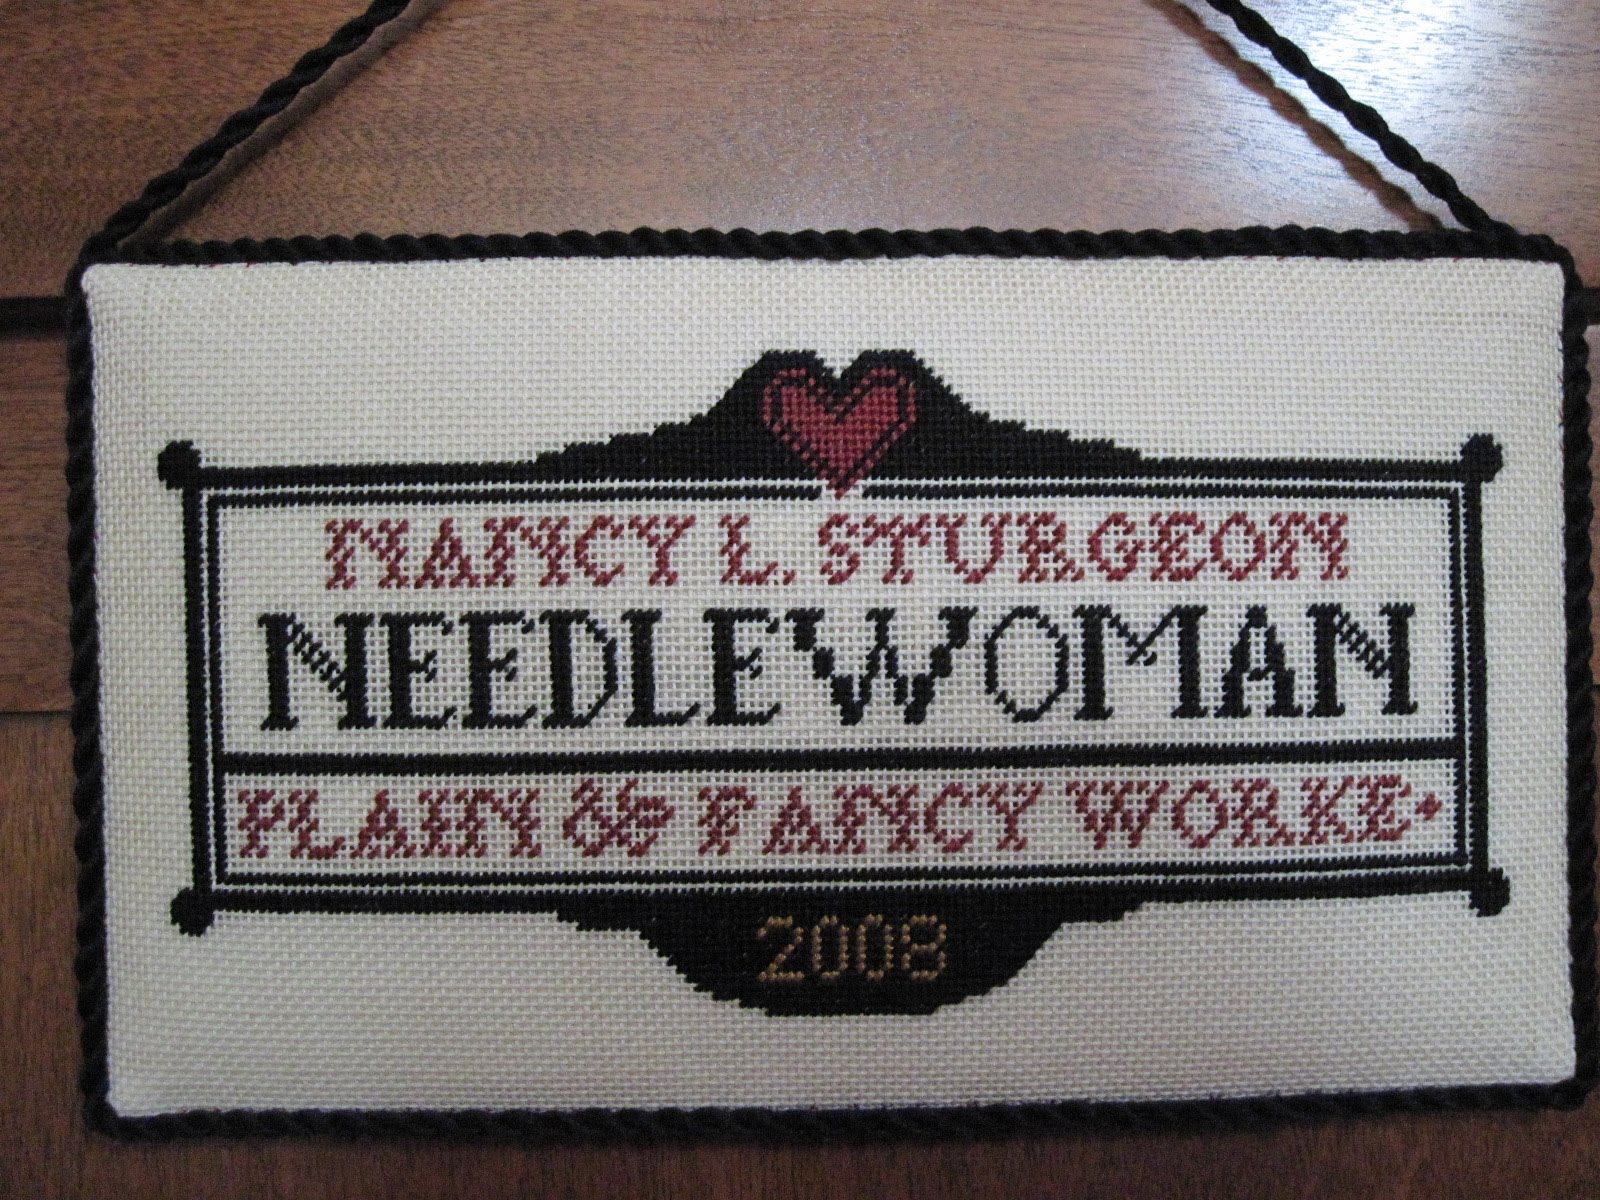 Threads through time prairie schooler santas msi sampler 1771 carriage house name plate - Name plate designs for home ...